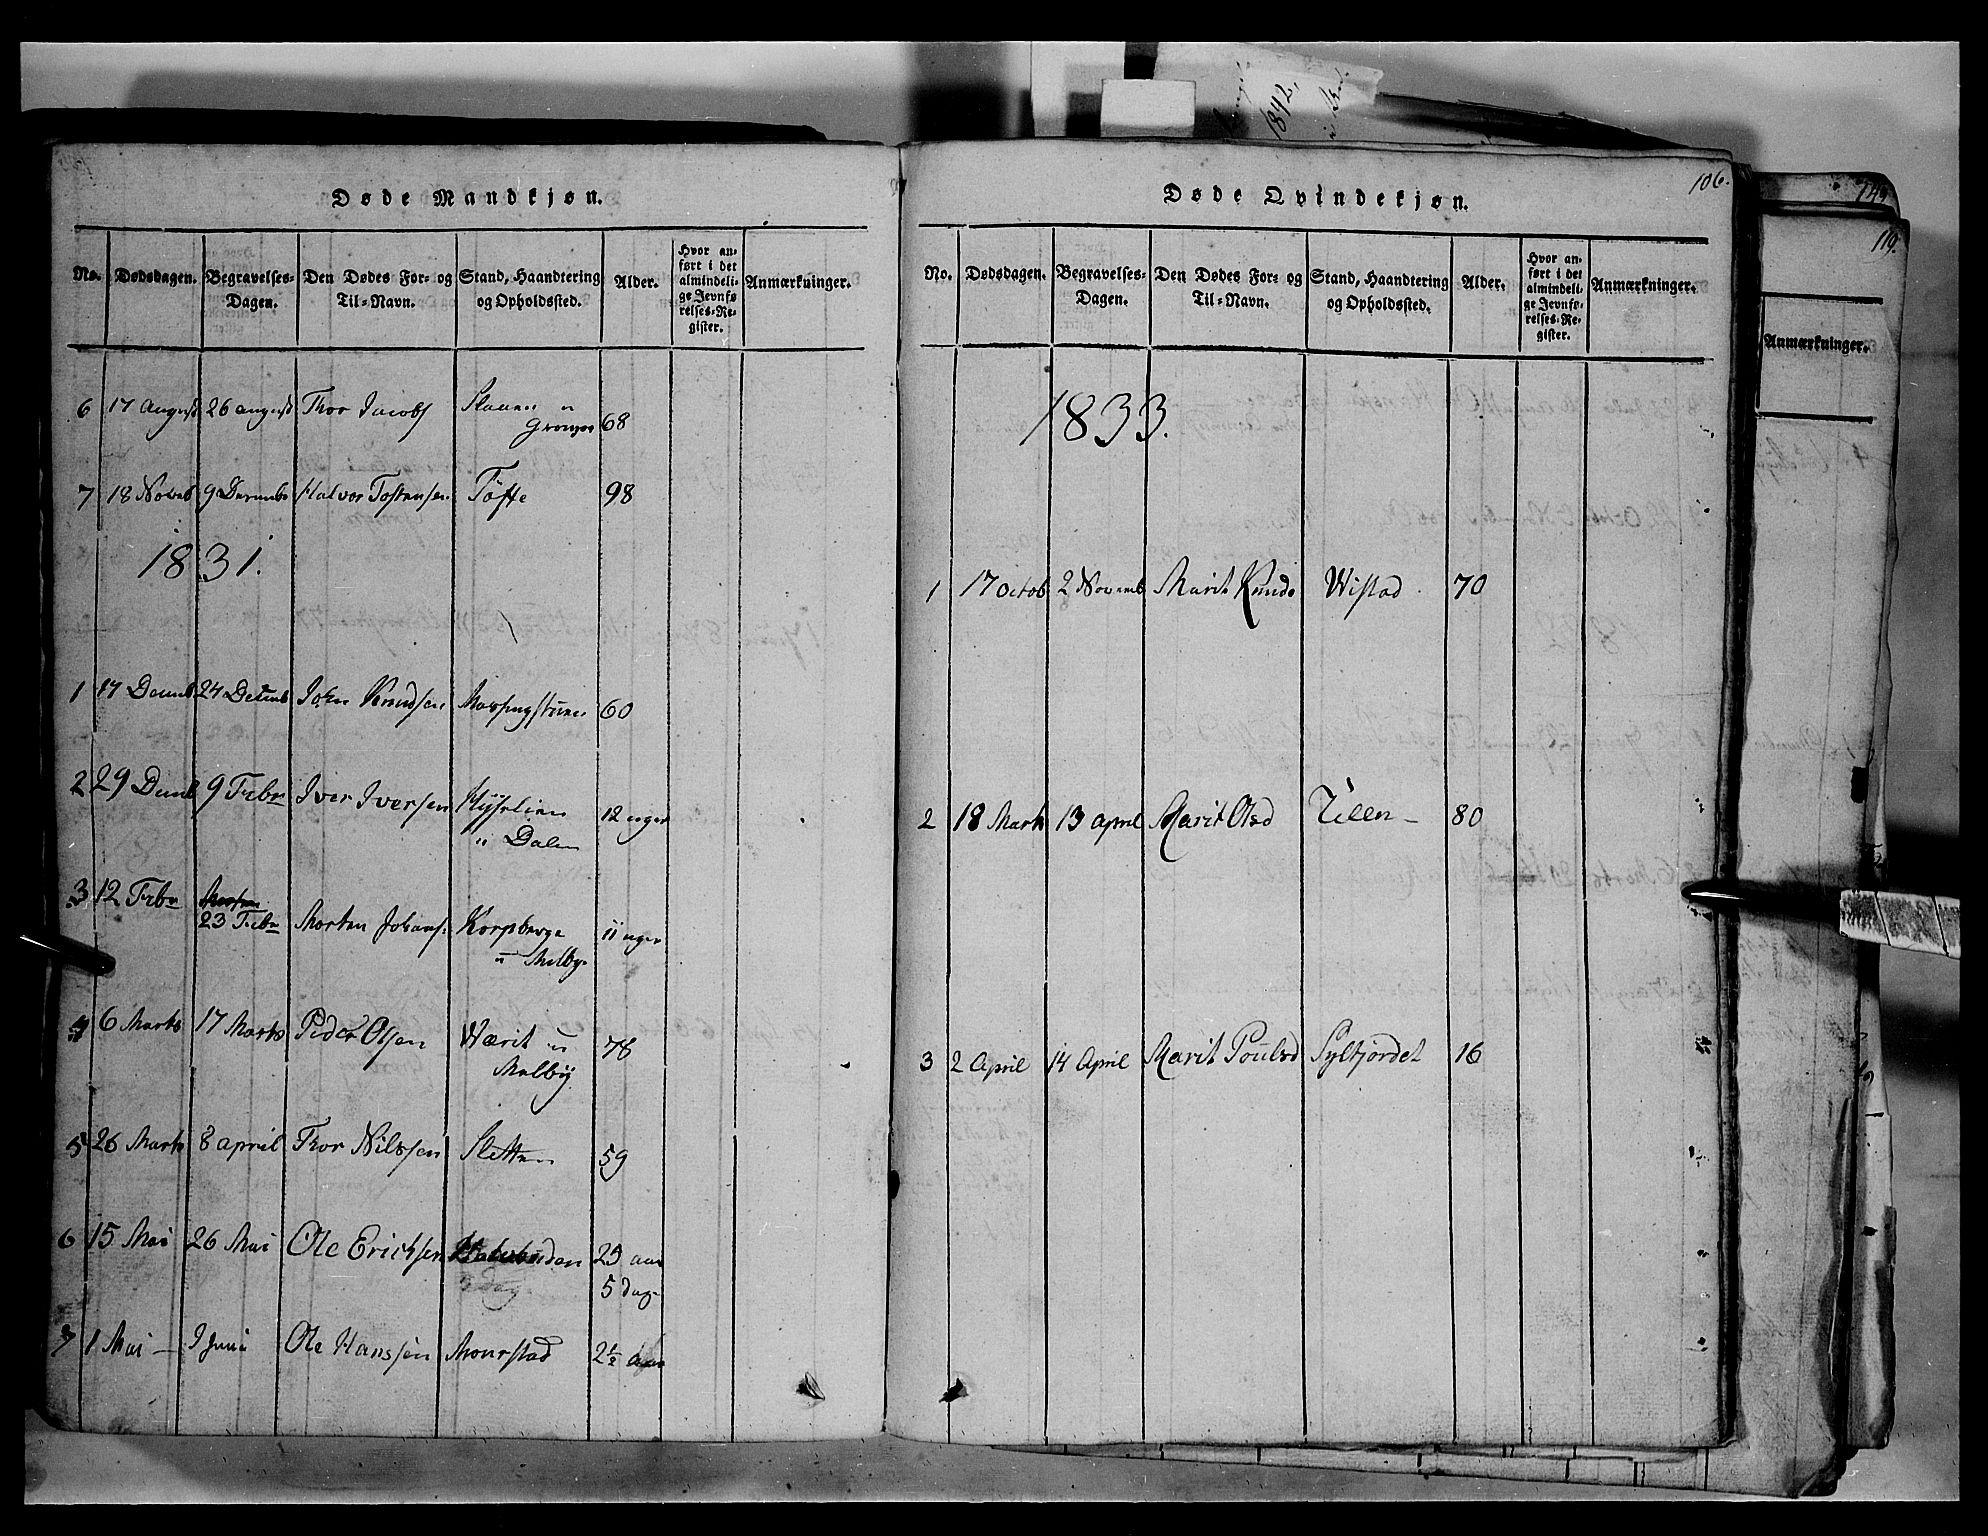 SAH, Fron prestekontor, H/Ha/Hab/L0003: Klokkerbok nr. 3, 1816-1850, s. 106